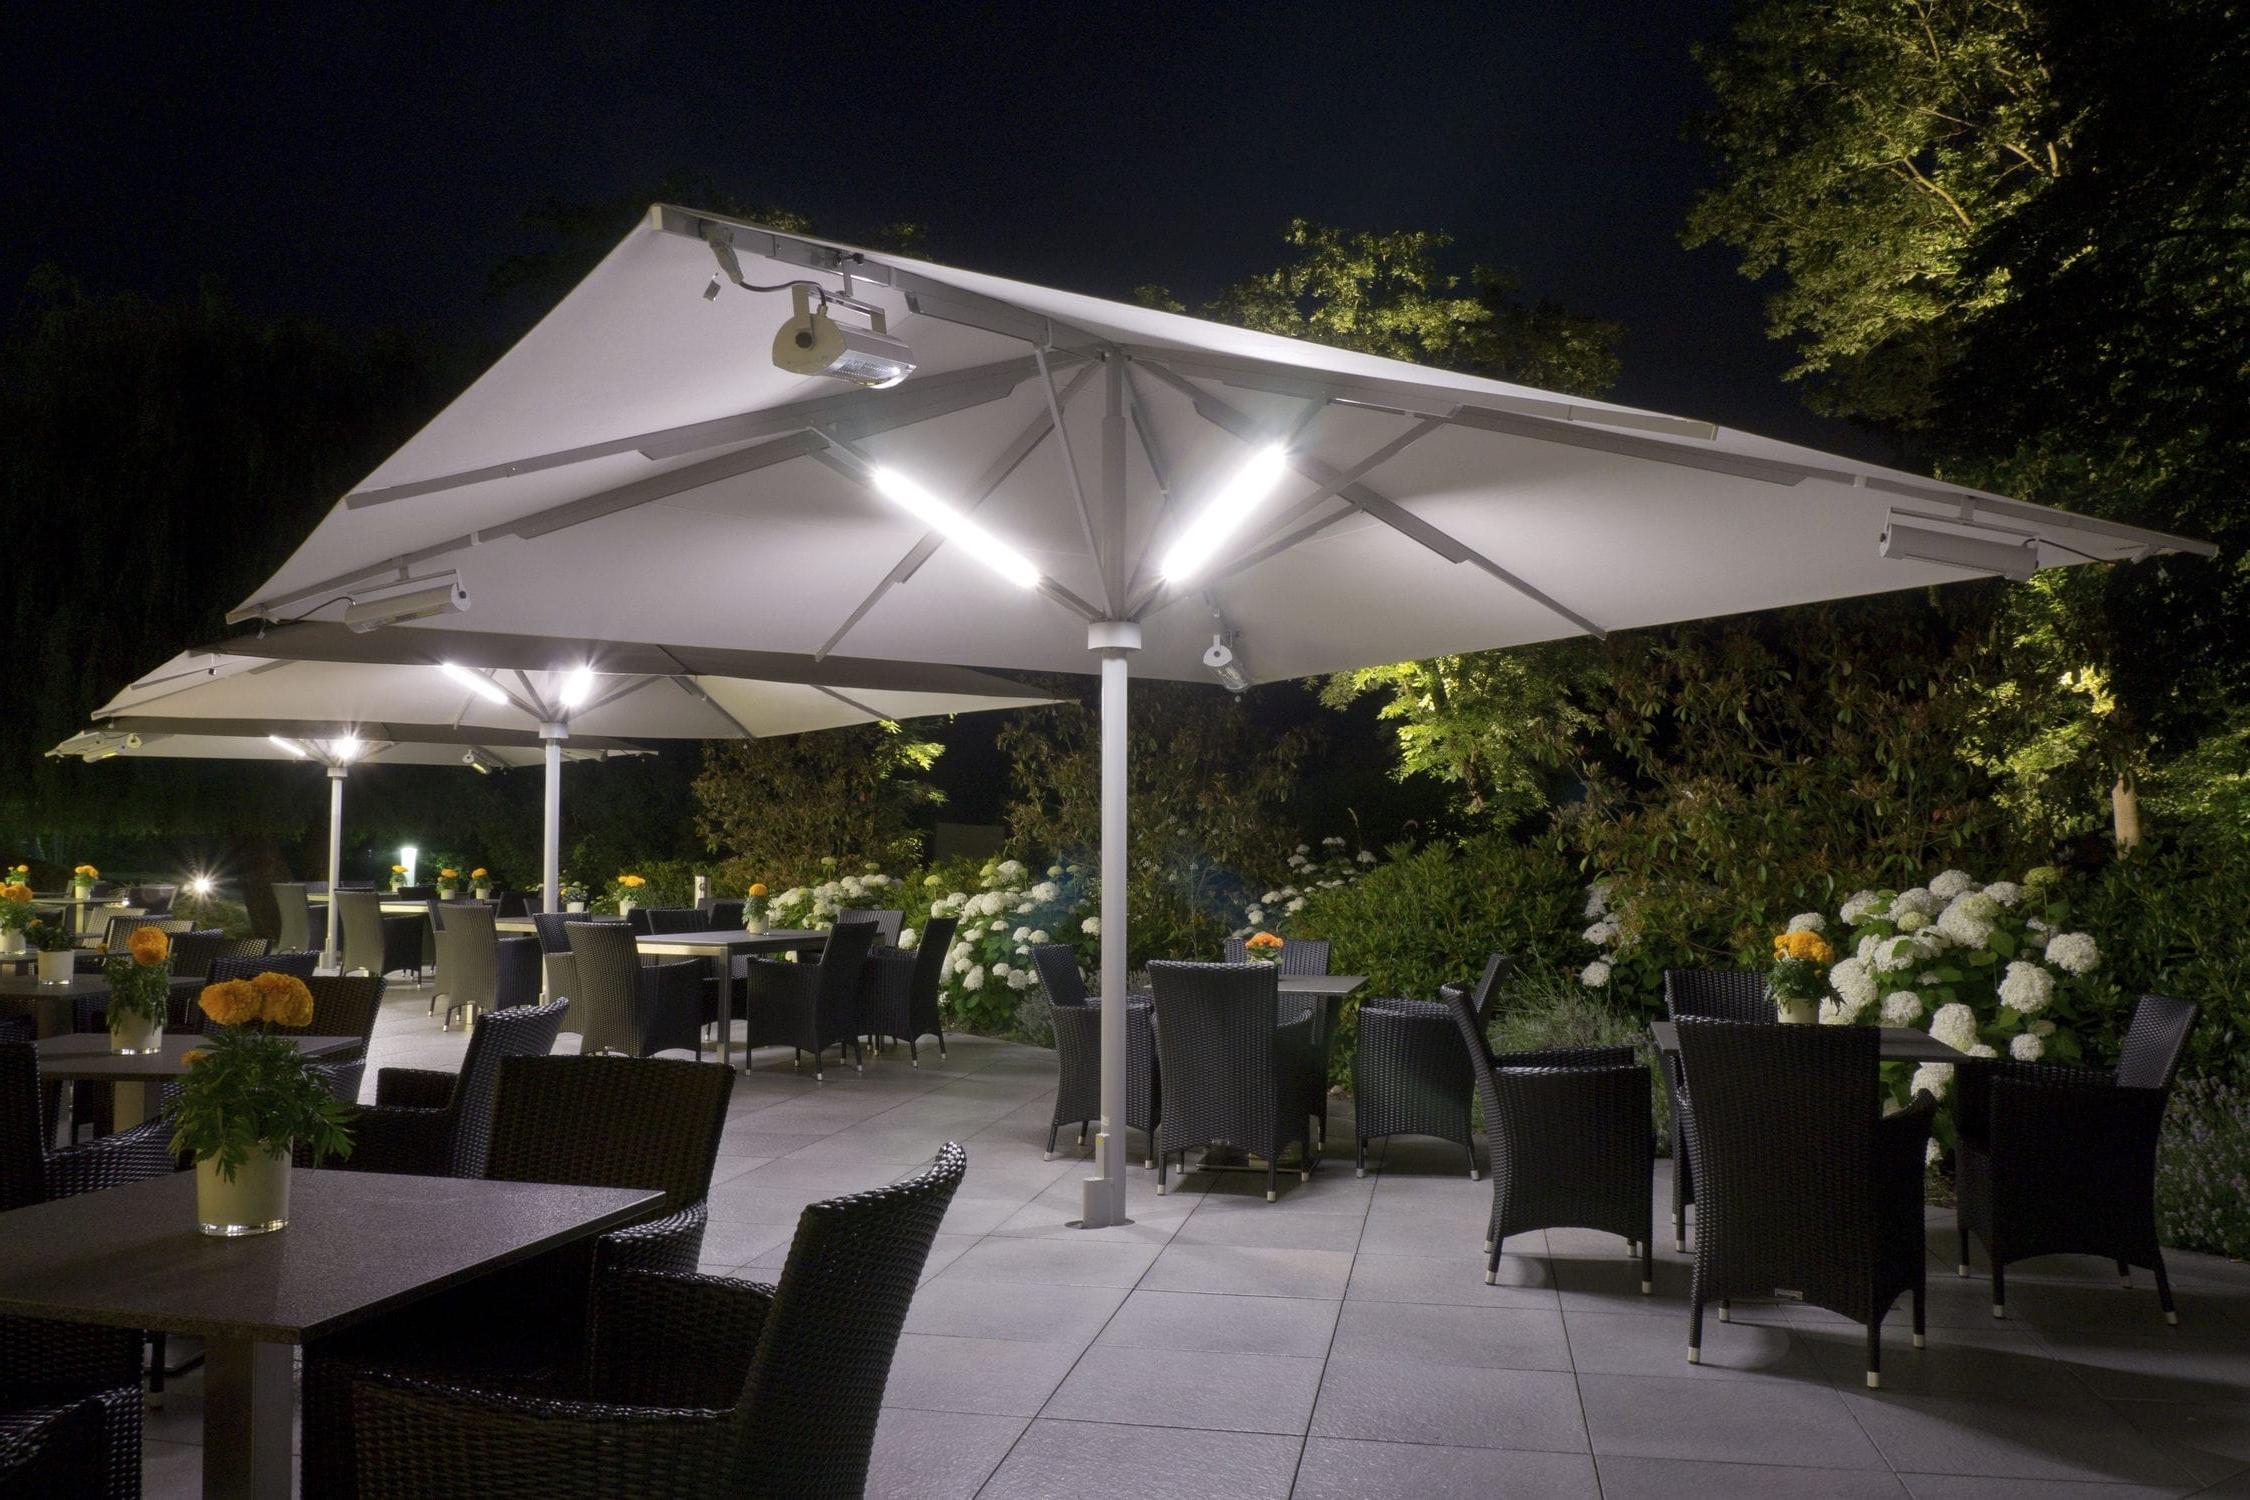 Solar Powered Lights For Patio Umbrellas • Patio Ideas Inside Famous European Patio Umbrellas (View 17 of 20)